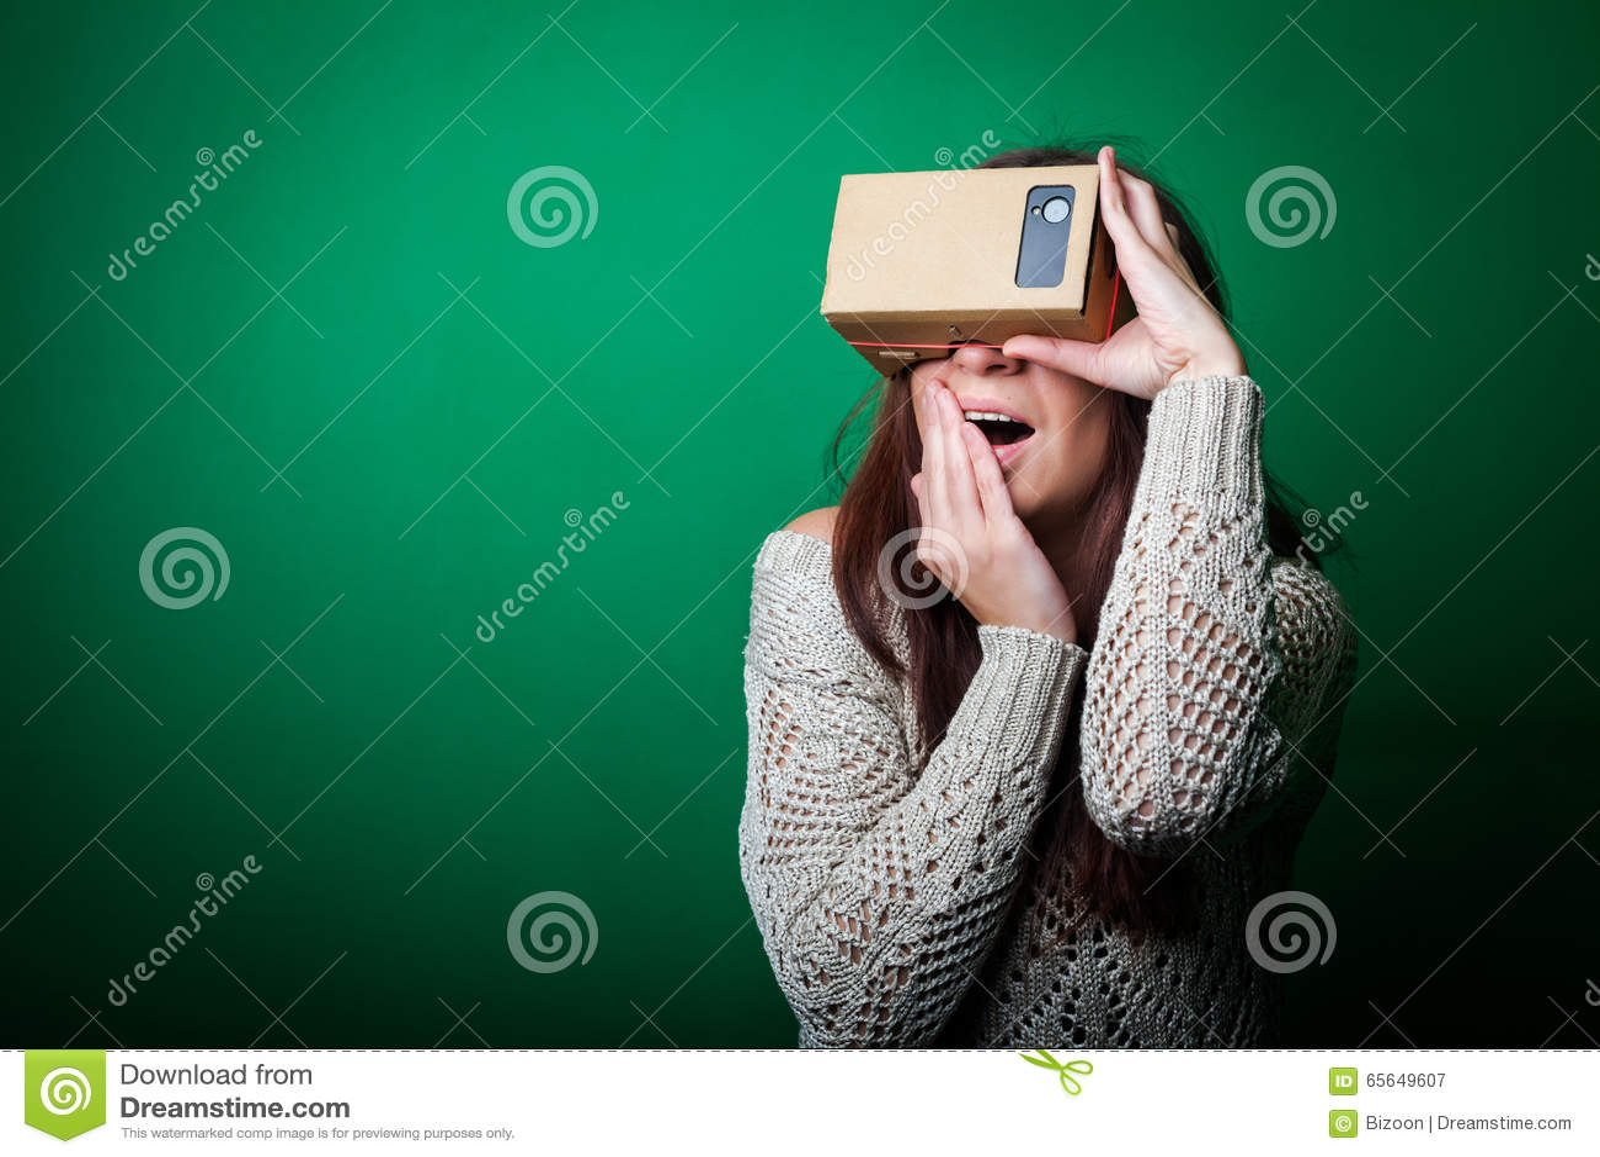 Karton virtuele werkelijkheid